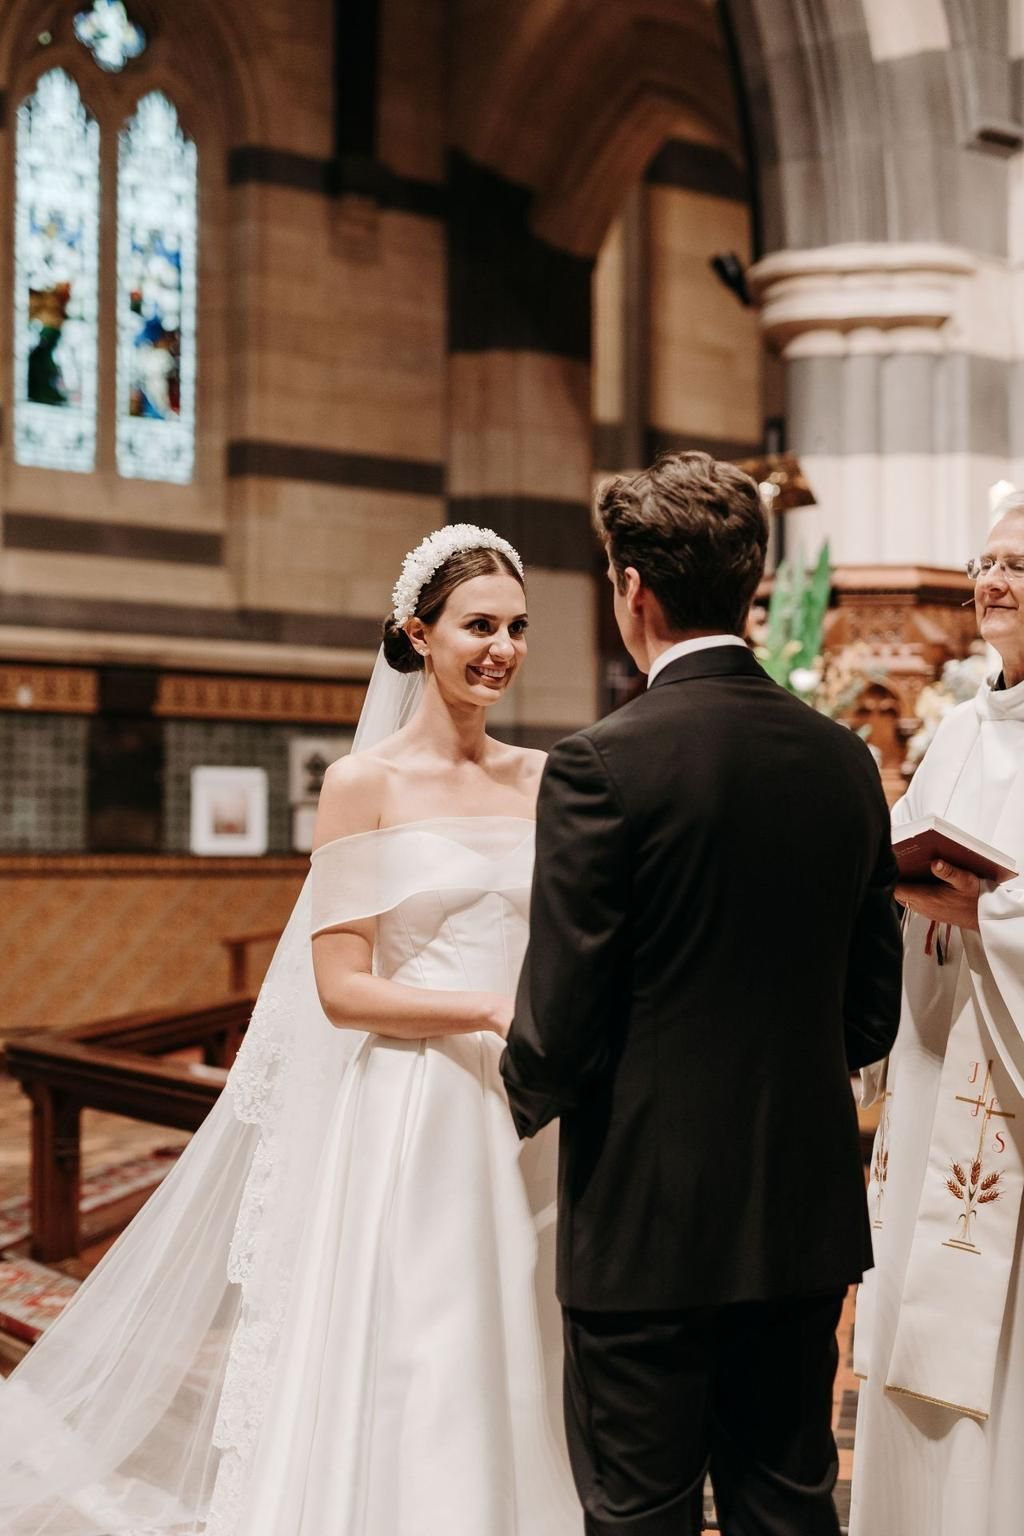 Inside A Classic Melbourne Wedding Set At An Iconic Cathedral In 2020 Melbourne Wedding Vogue Wedding Wedding Sets